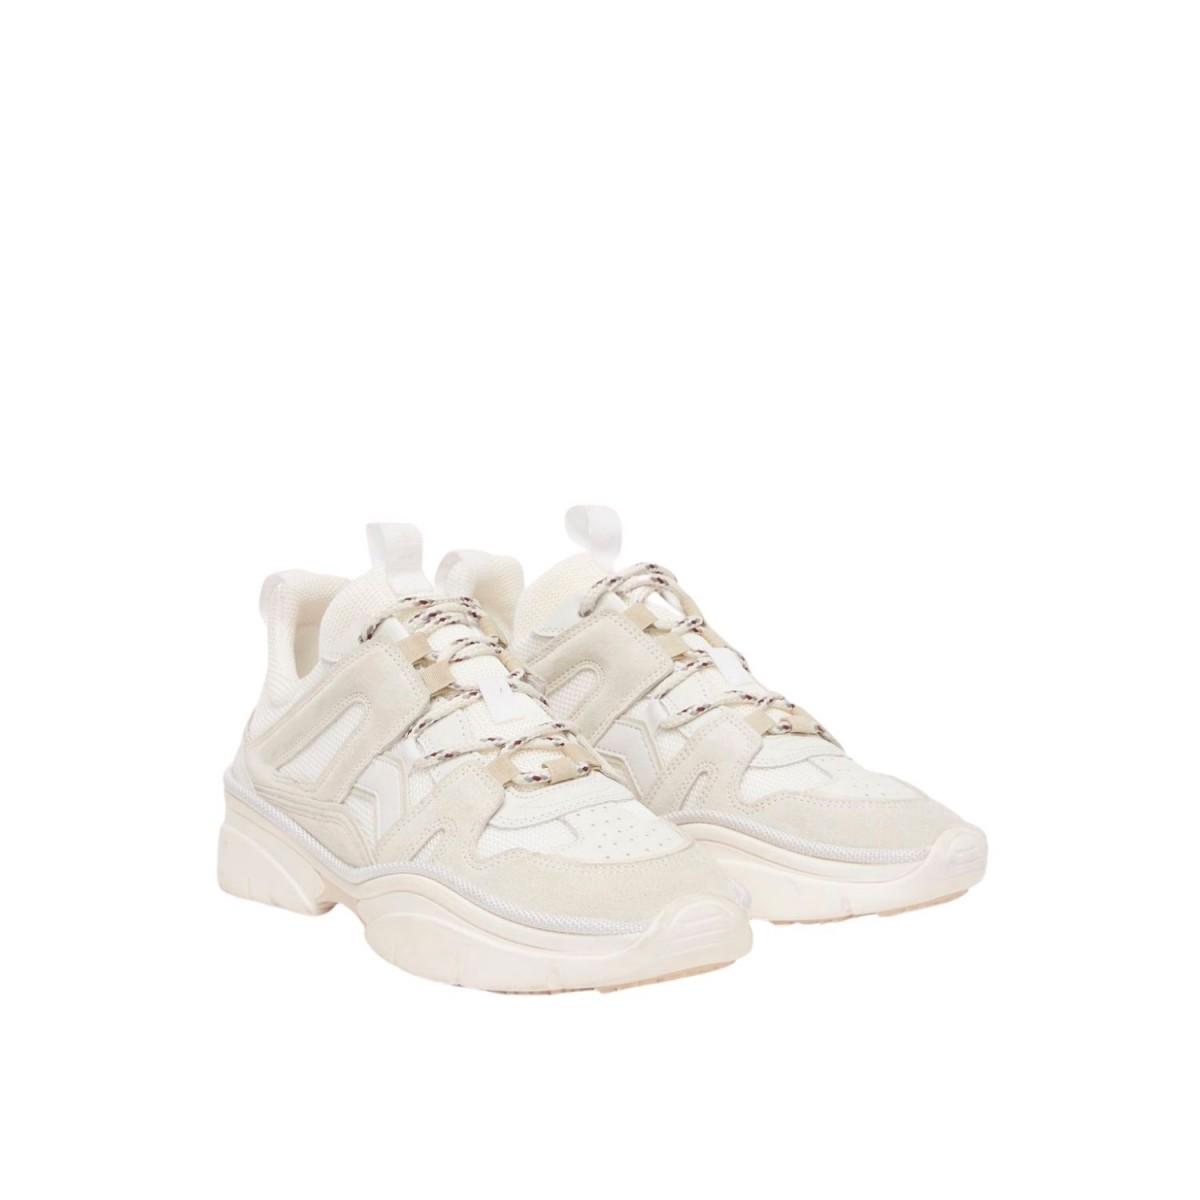 kindsay sneakers - chalk